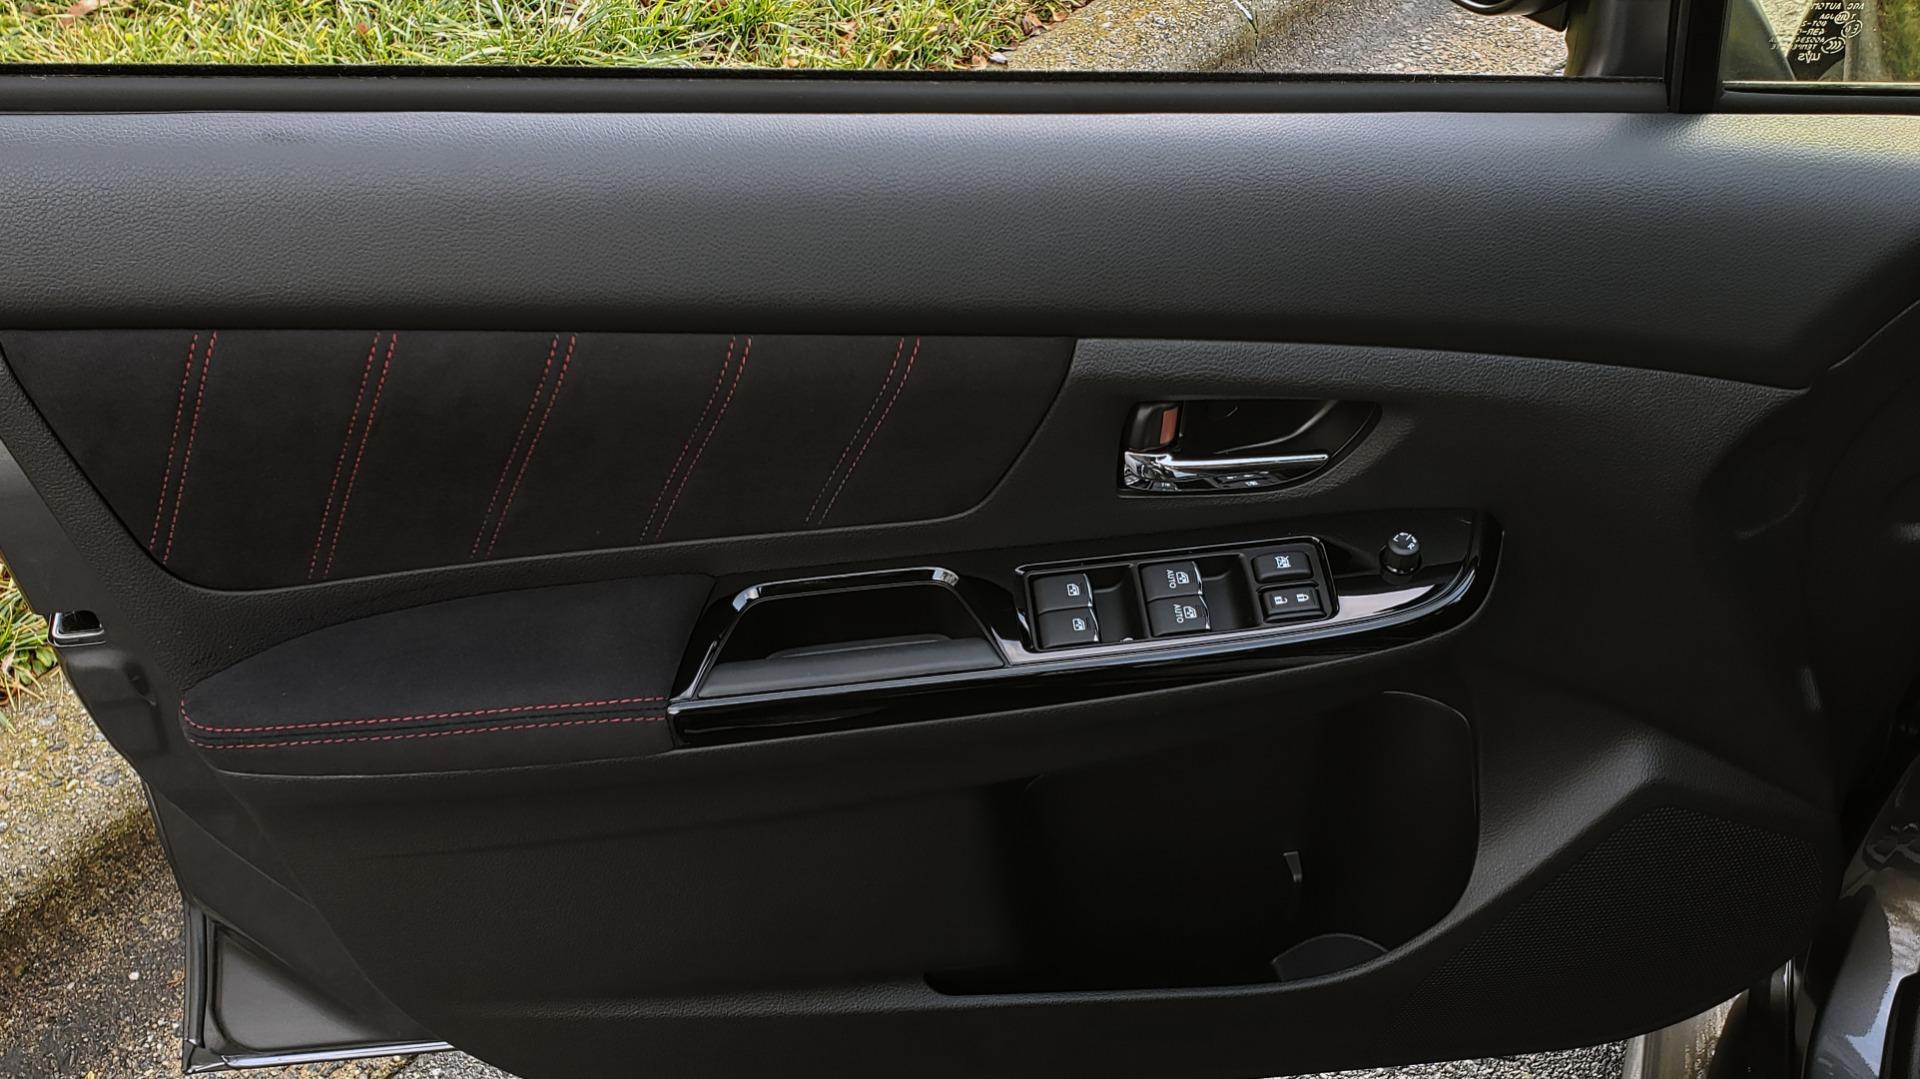 Used 2020 Subaru WRX STI 2.5L TURBO / 6-SPEED MANUAL / RECARO SEATS / REARVIEW for sale Sold at Formula Imports in Charlotte NC 28227 30